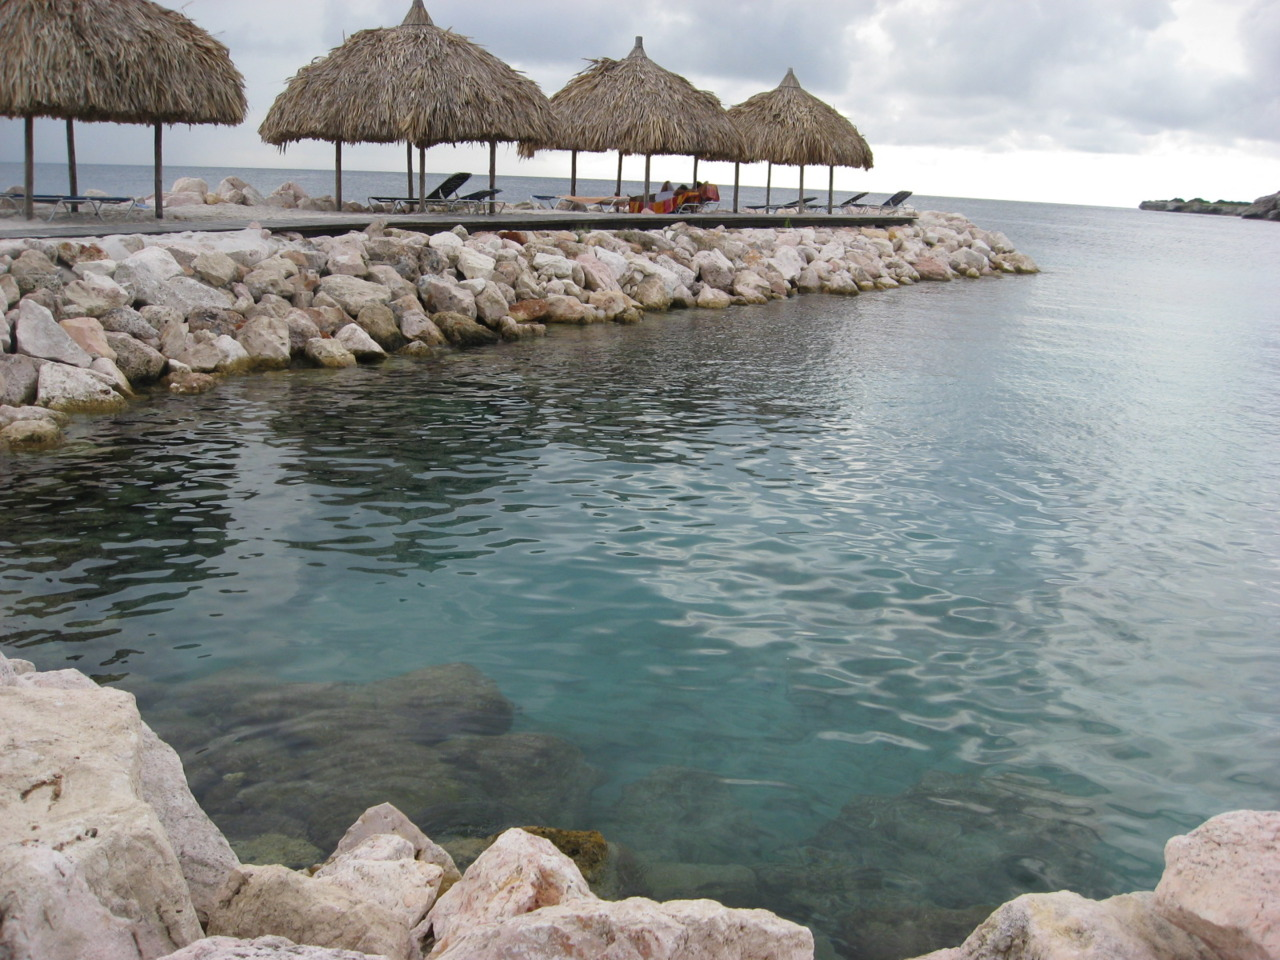 beaches of Curacao, Blue Bay